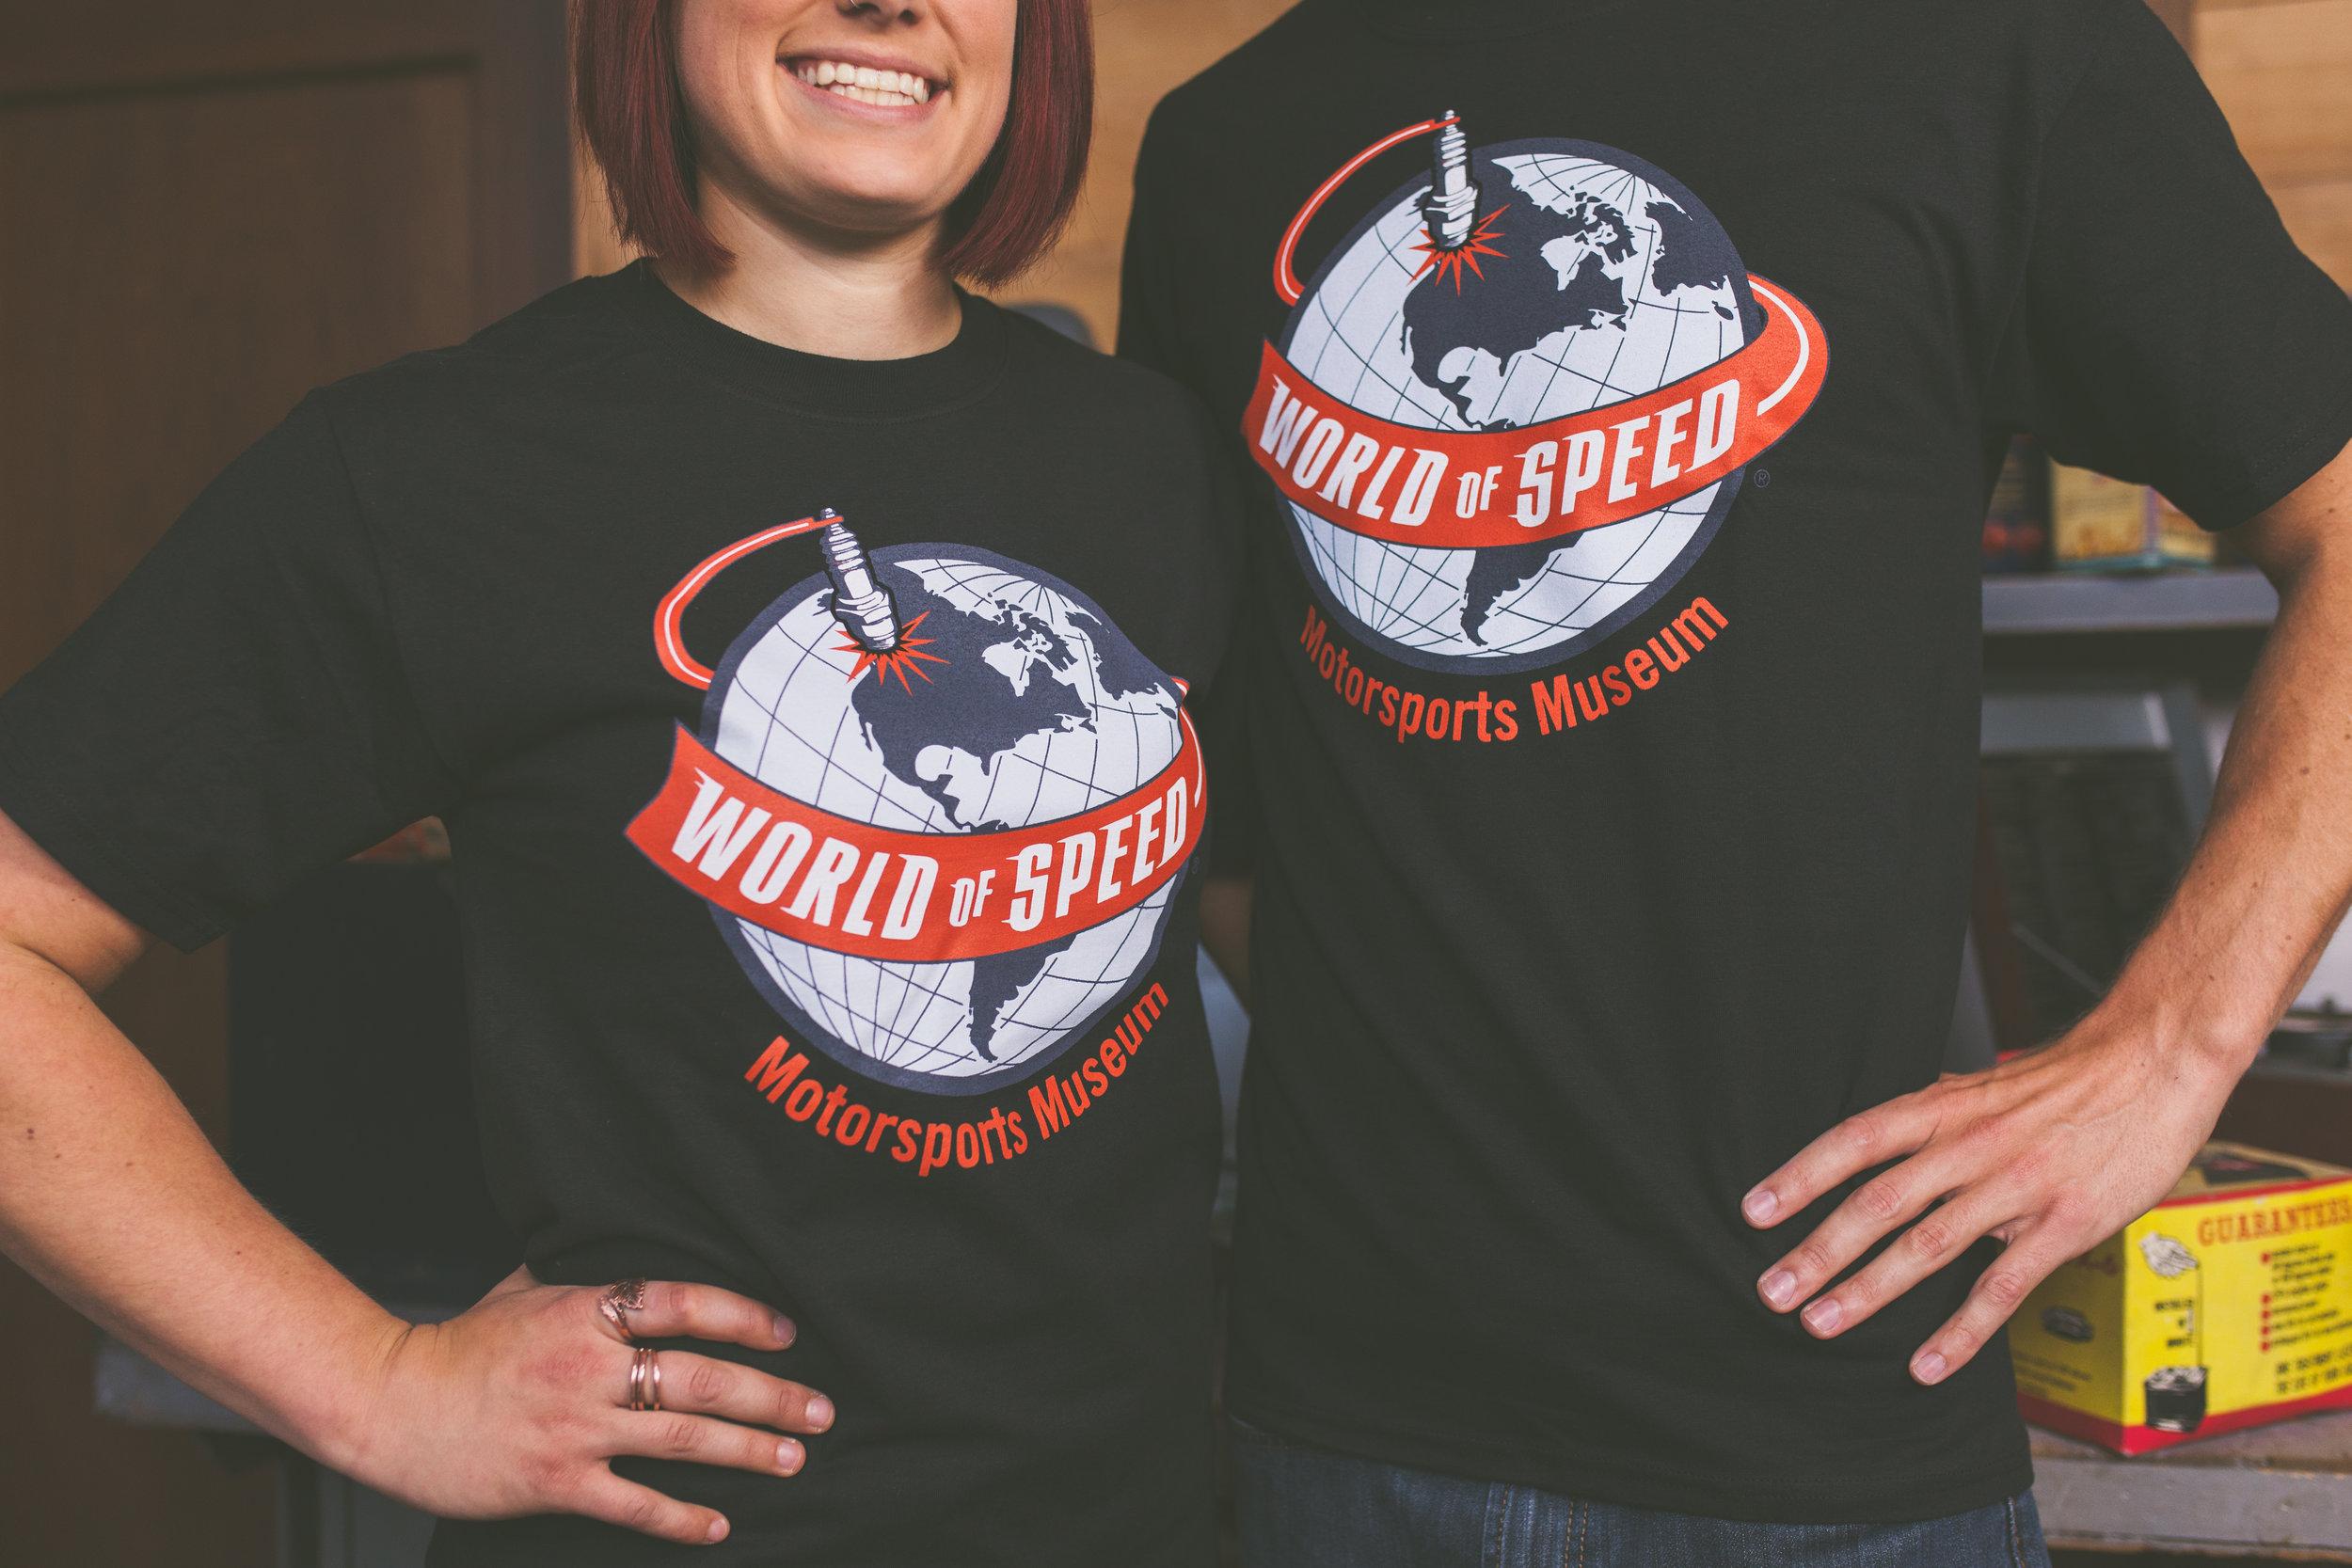 World of Speed Web Store-18.jpg